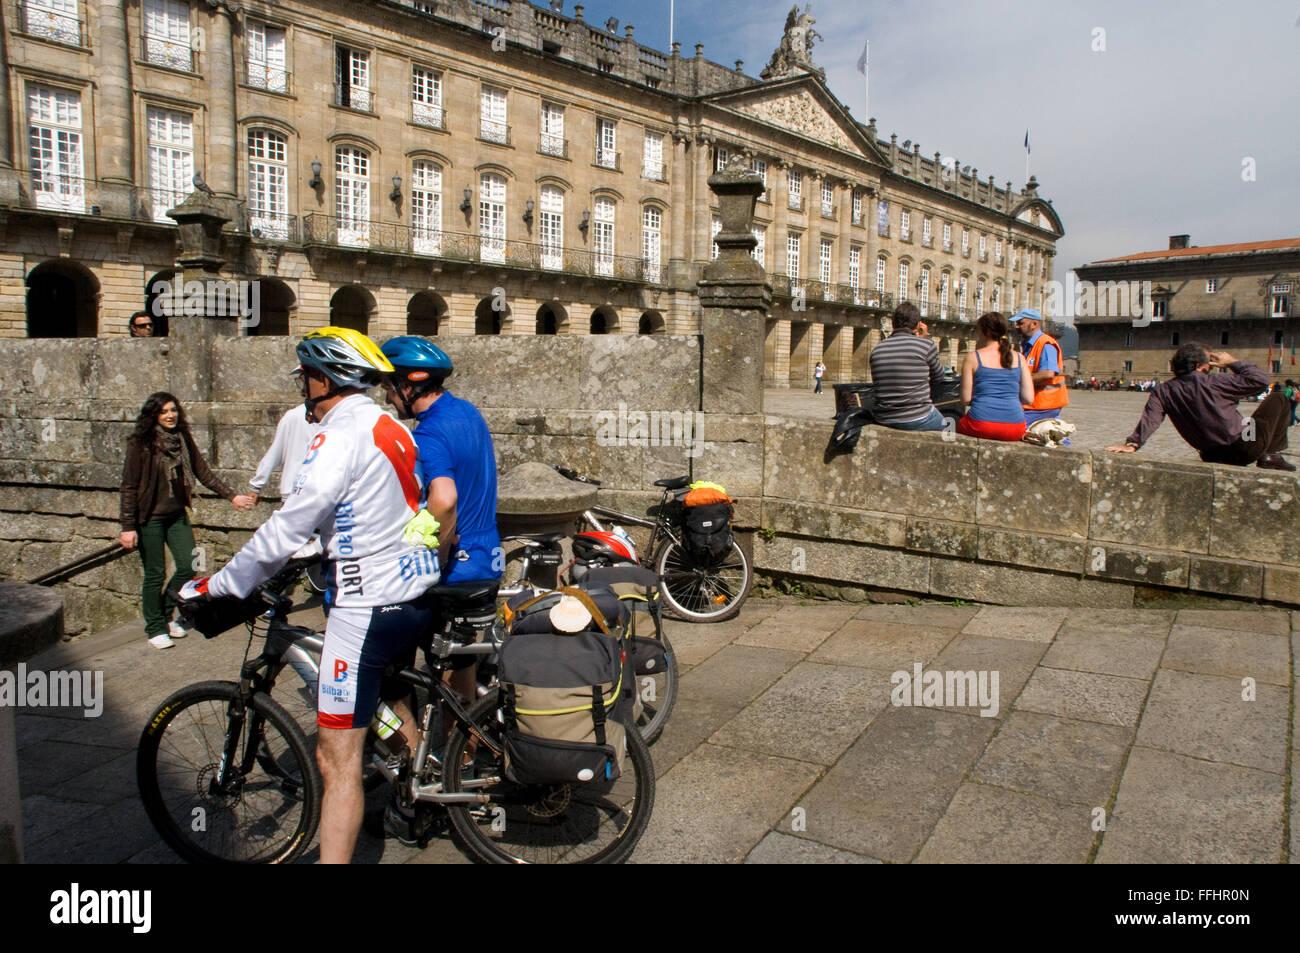 Way of St. James, Jacobean Route. Cyclists in the Obradoiro Square. Santiago de Compostela. St. James's Way, - Stock Image